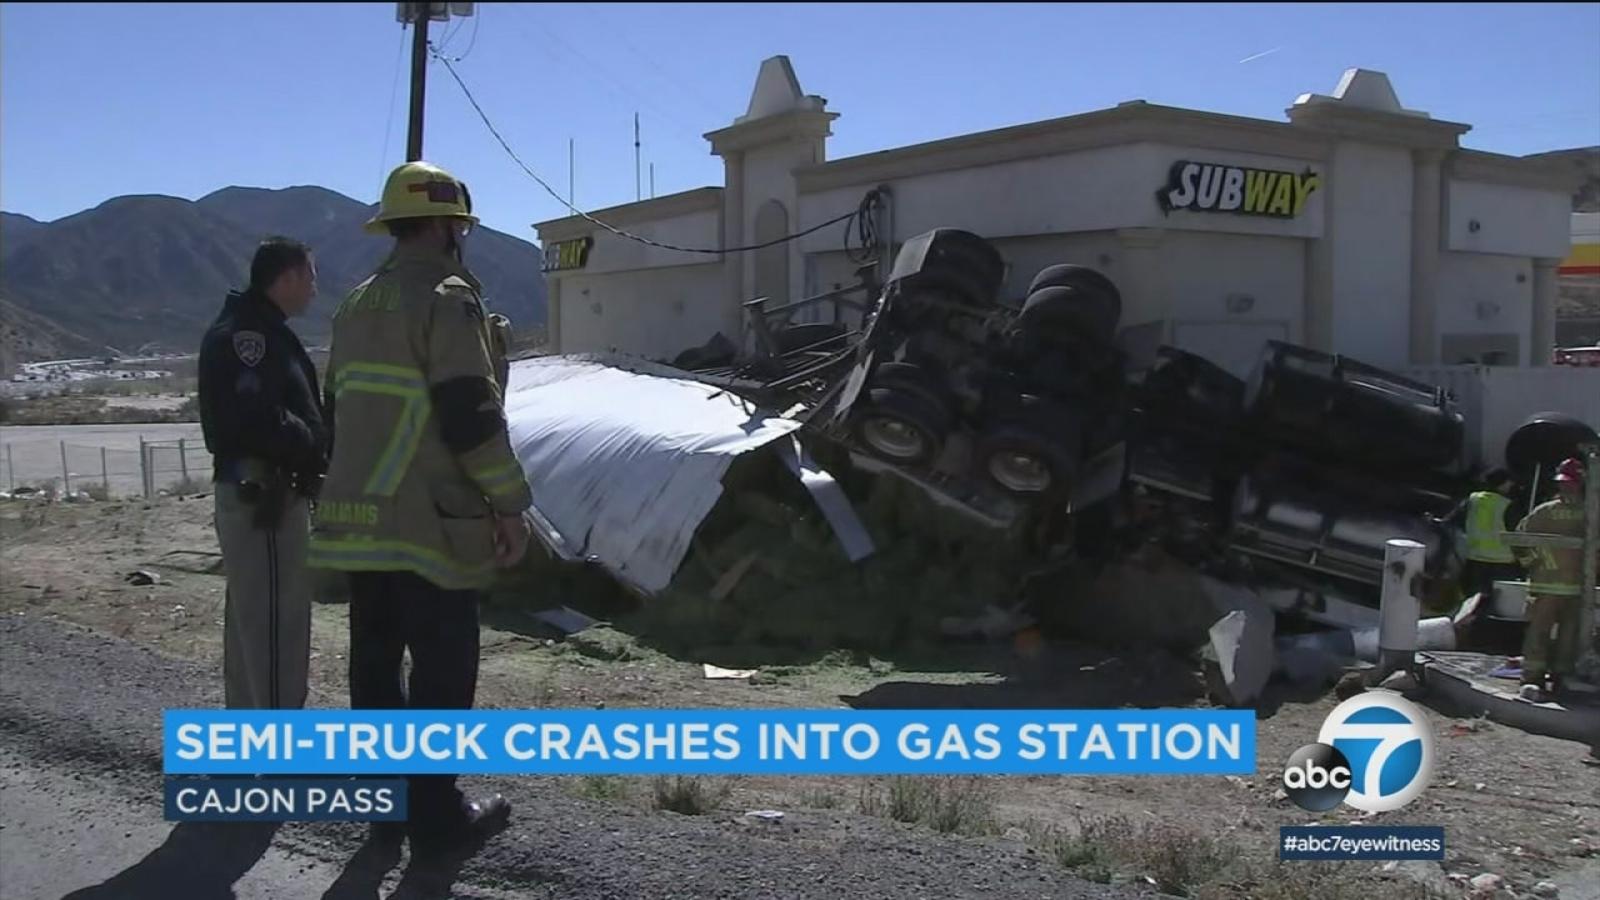 VIDEO: Semi-truck loses control, crashes into gas station in Cajon